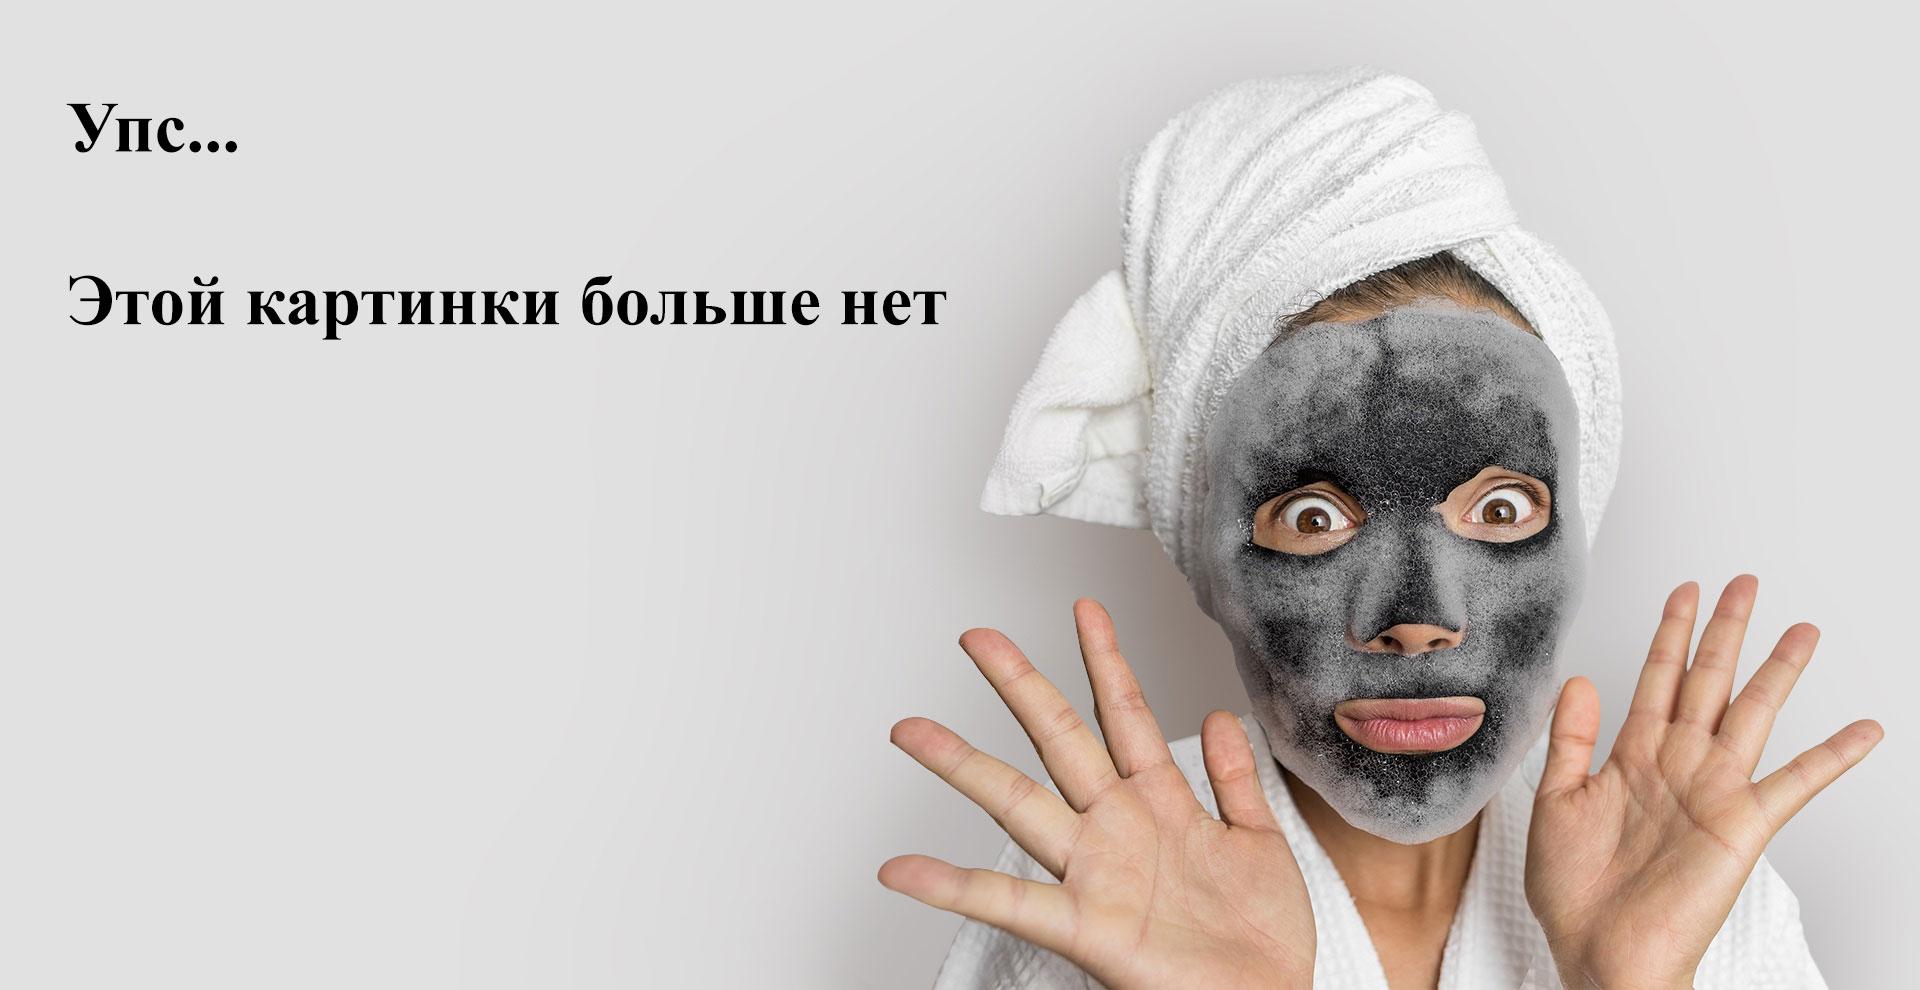 Shary, Тканевая маска для лица Green Clay 3 в 1, 25 г